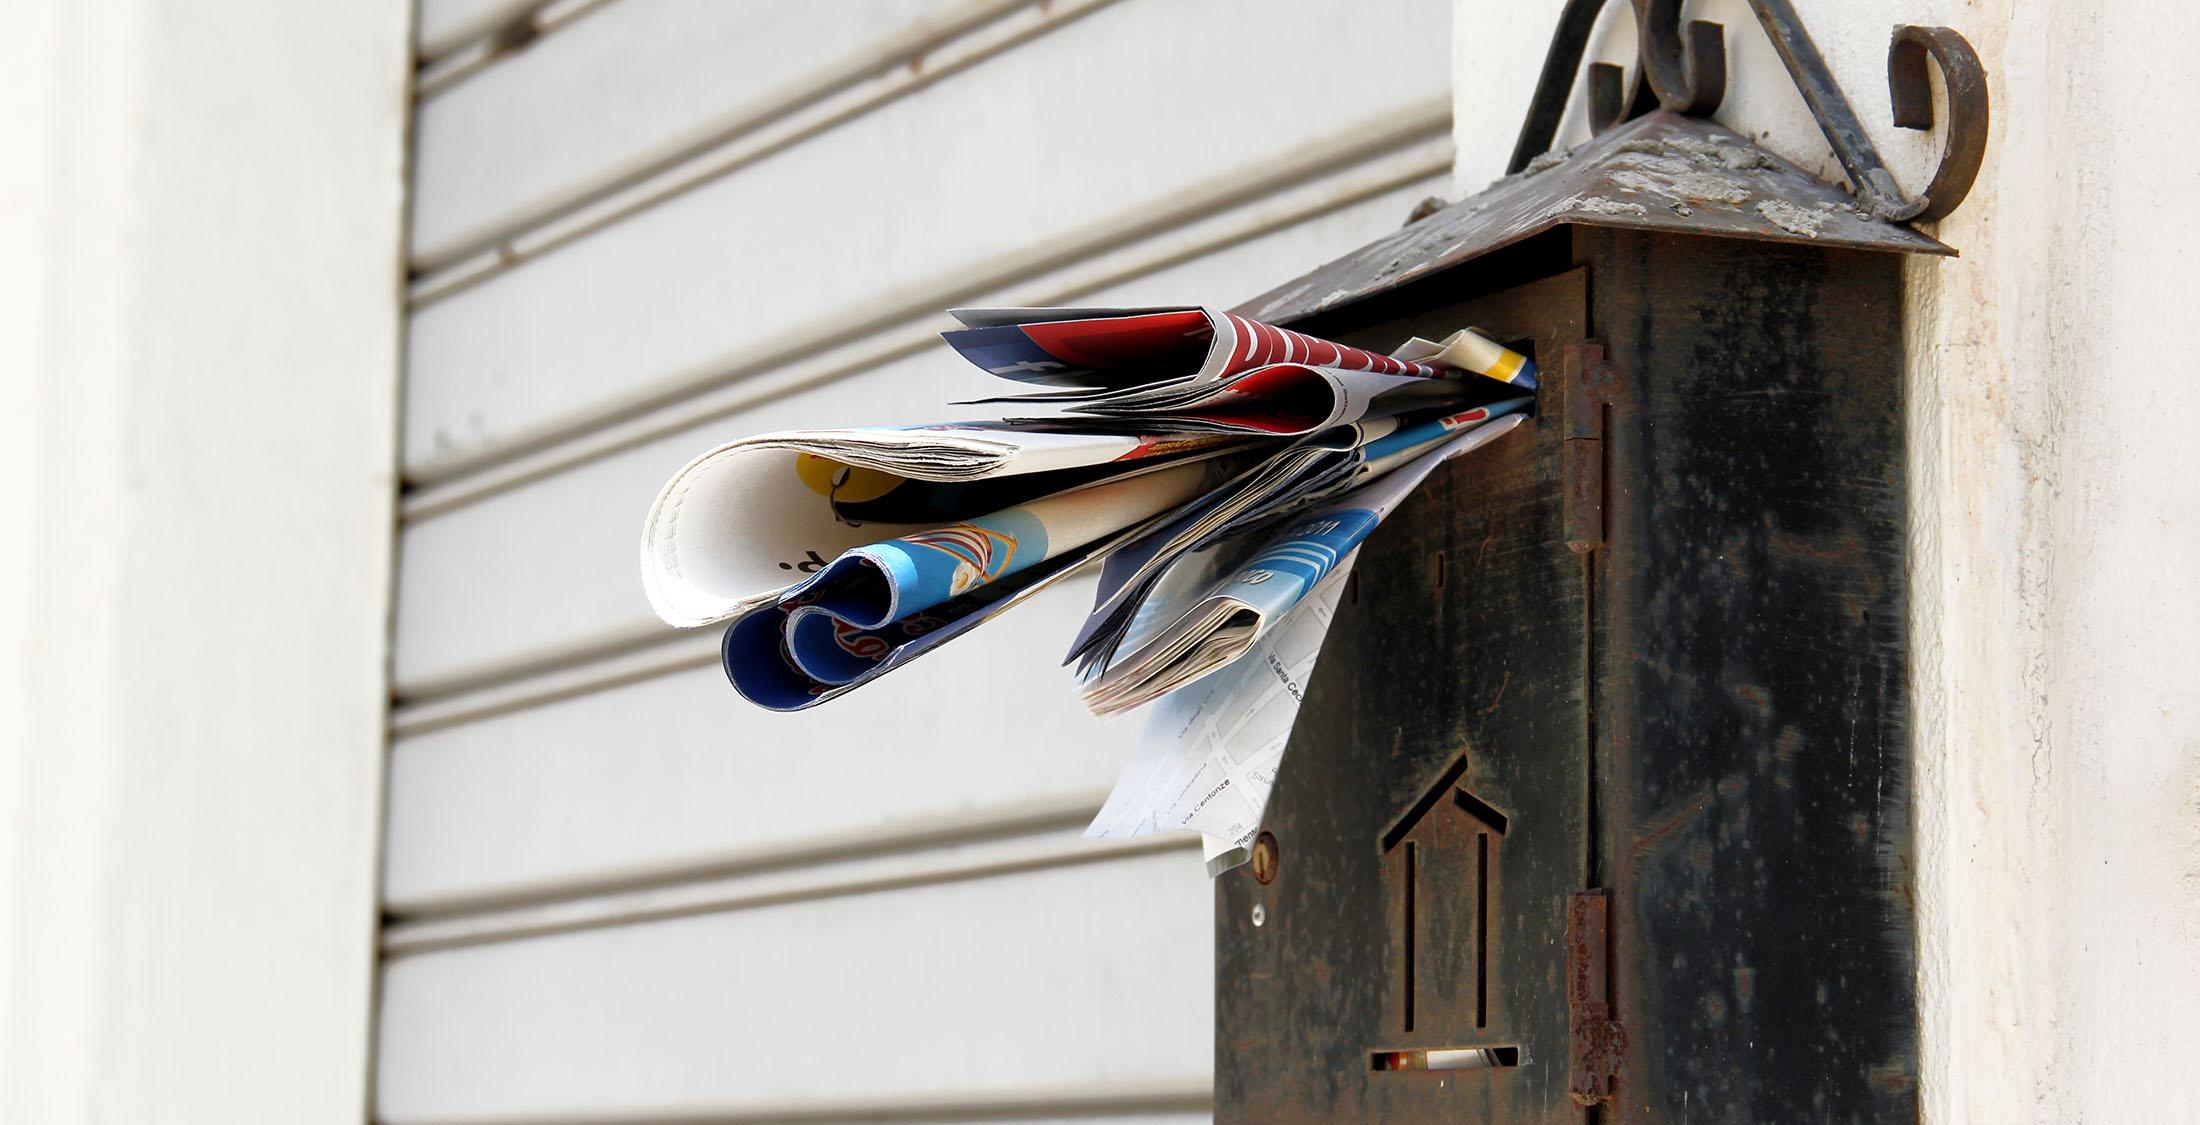 mail bursting through mail slot